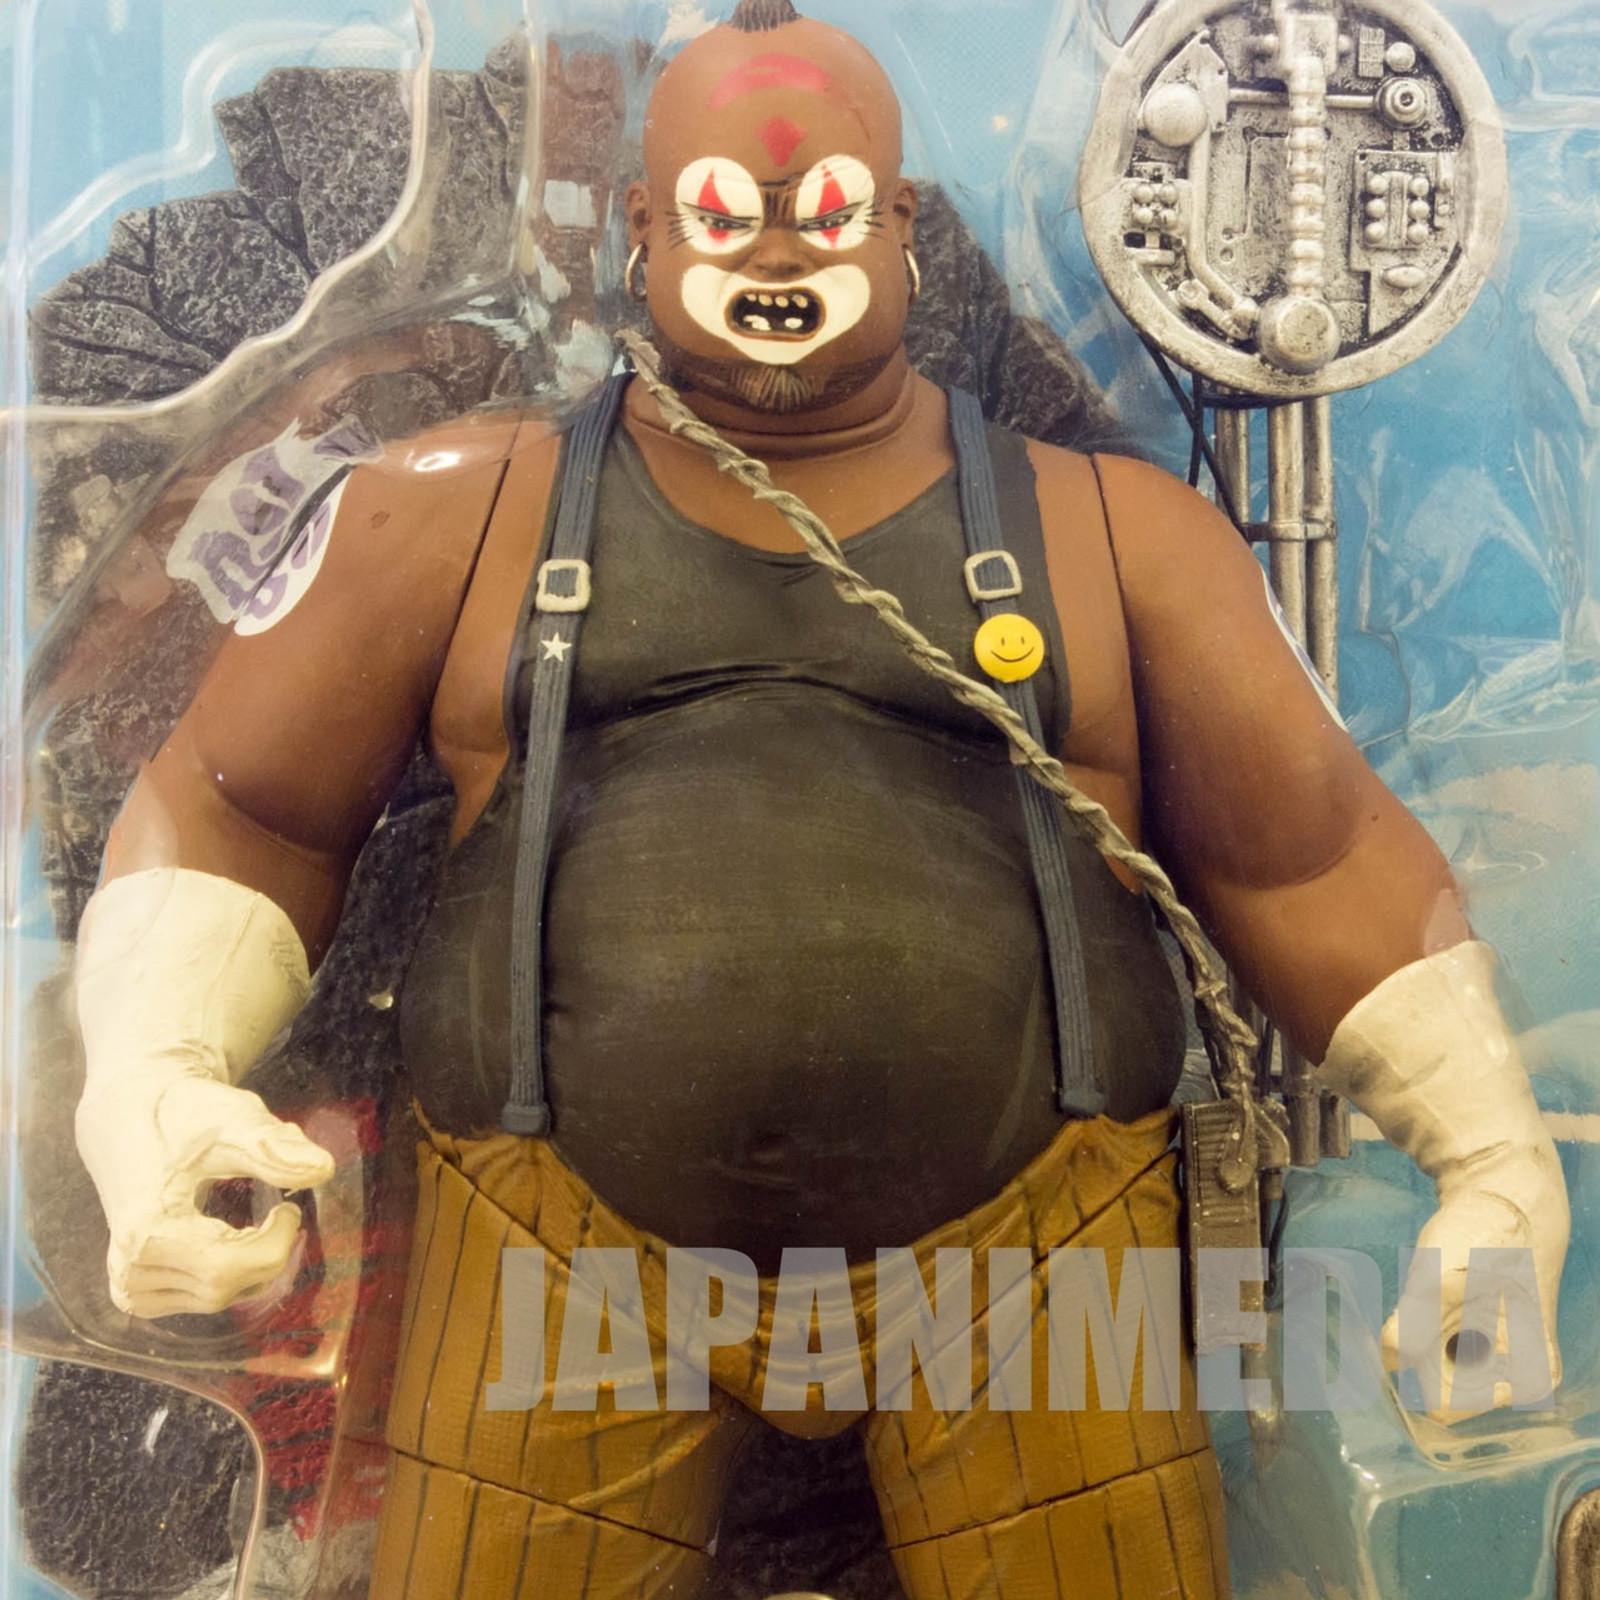 AKIRA Joker Clown Bike Gang Leader Figure Otomo Katsuhiro JAPAN ANIME MANGA